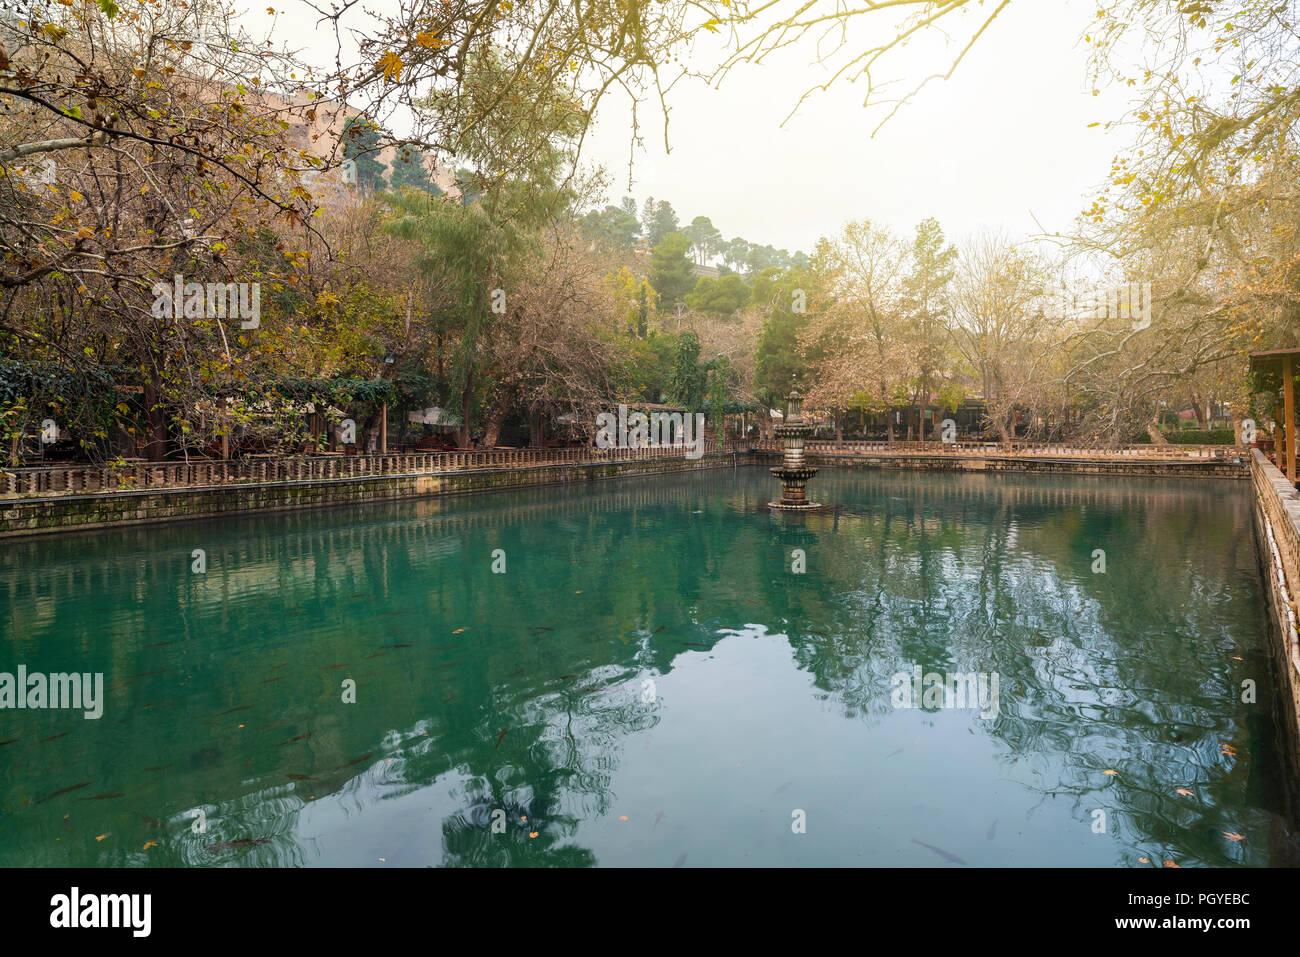 Lake Ayn Zeliha - Sanliurfa city - Turkey - Stock Image